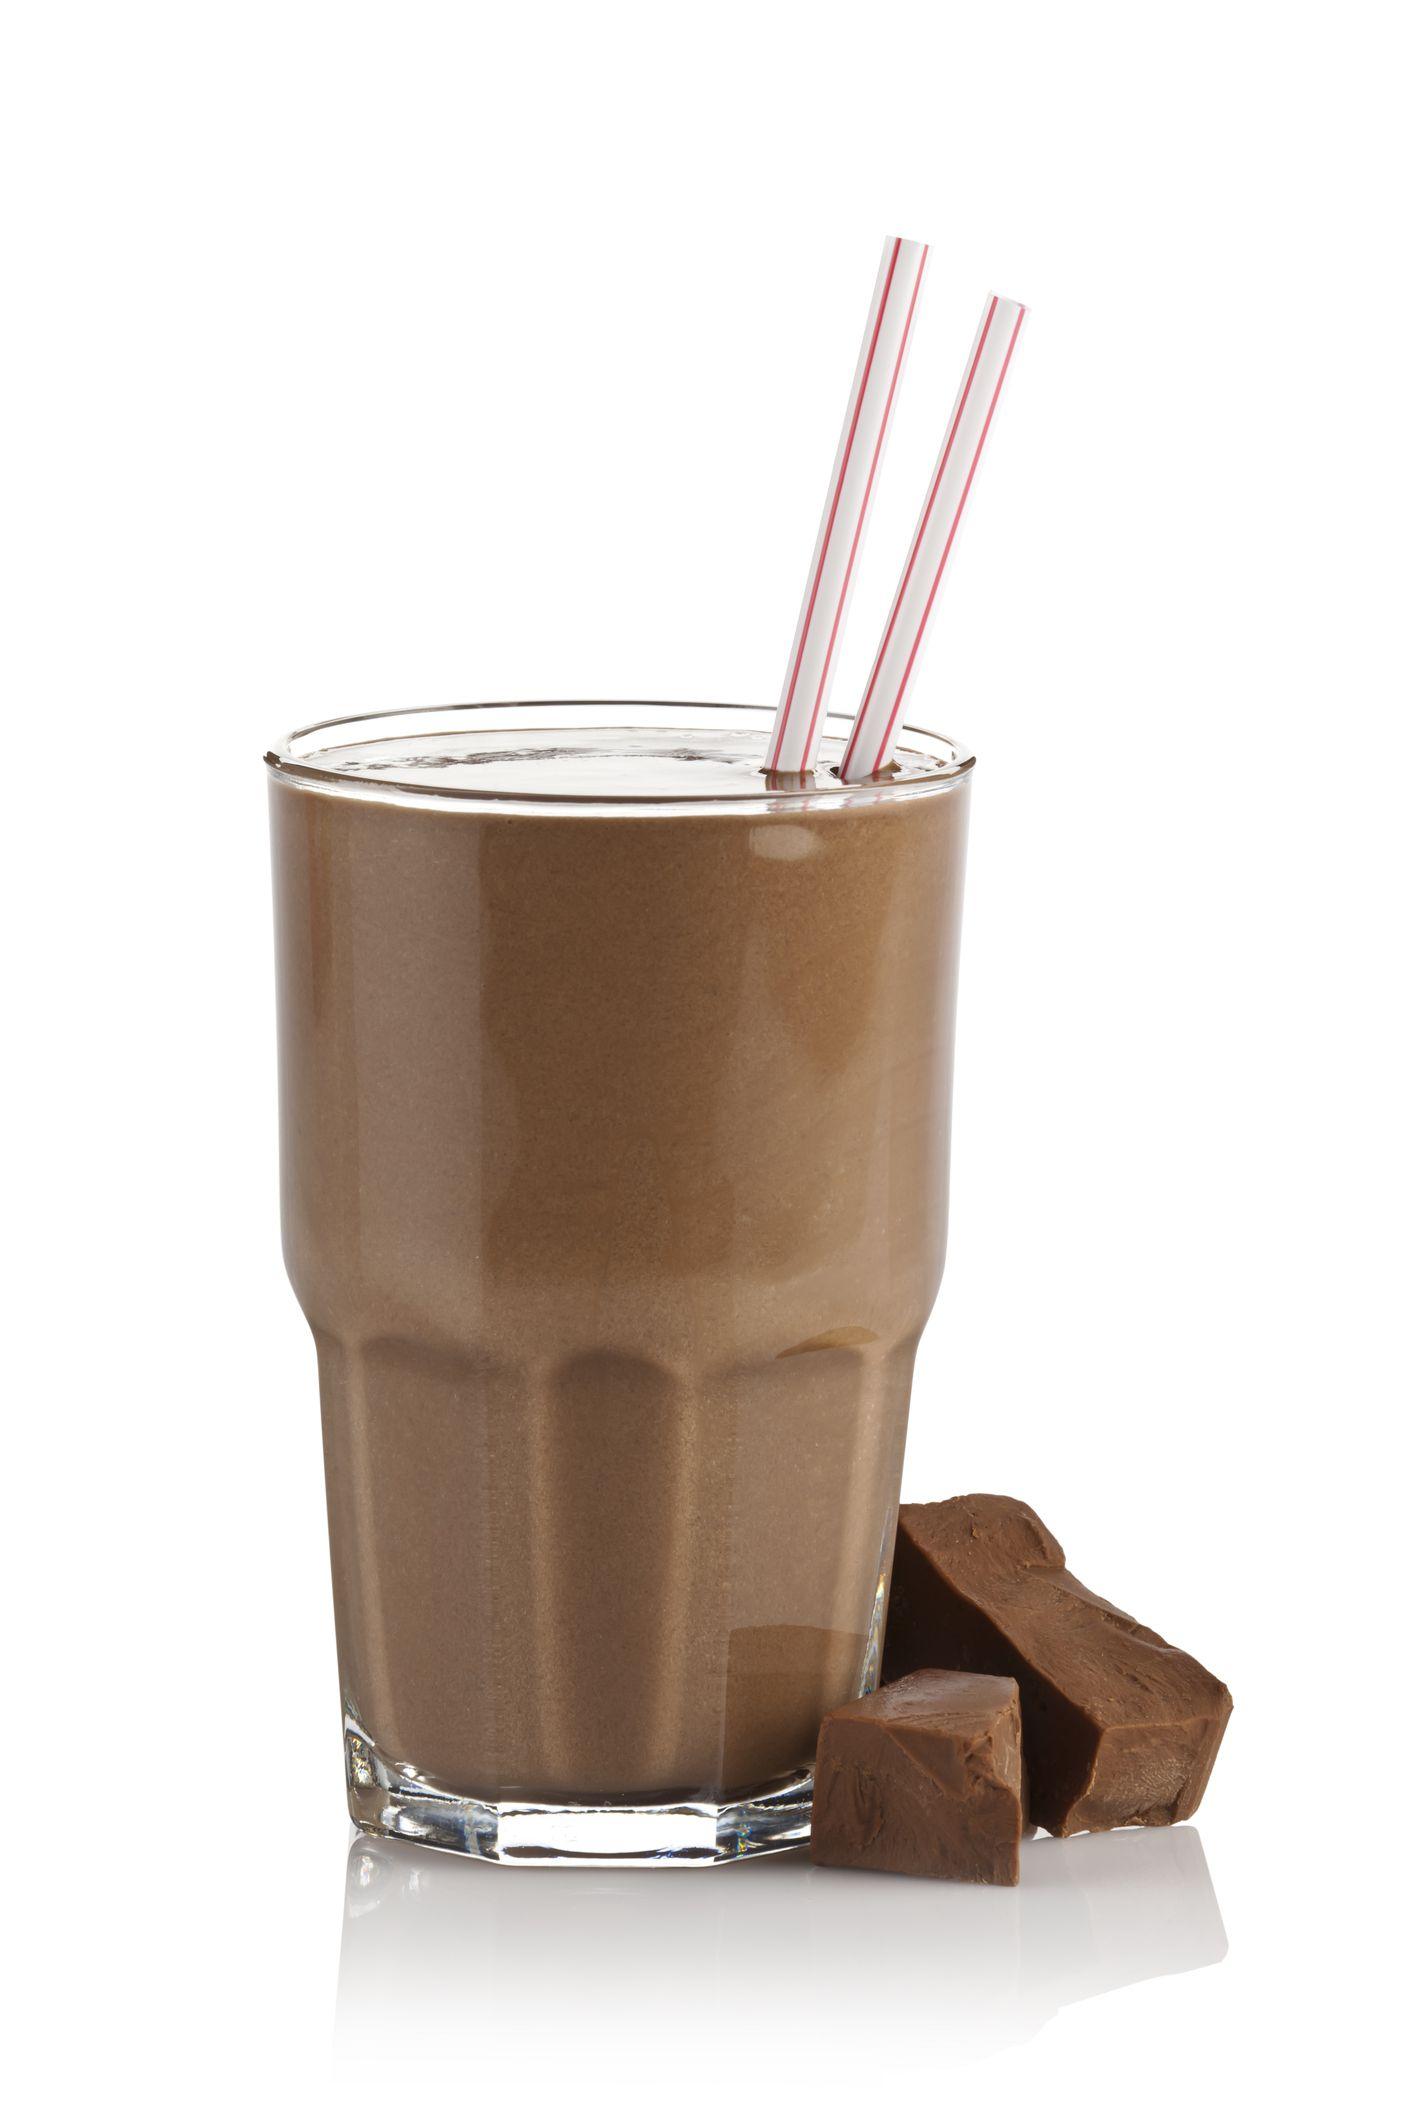 Chocolate milk shake smoothie on white background